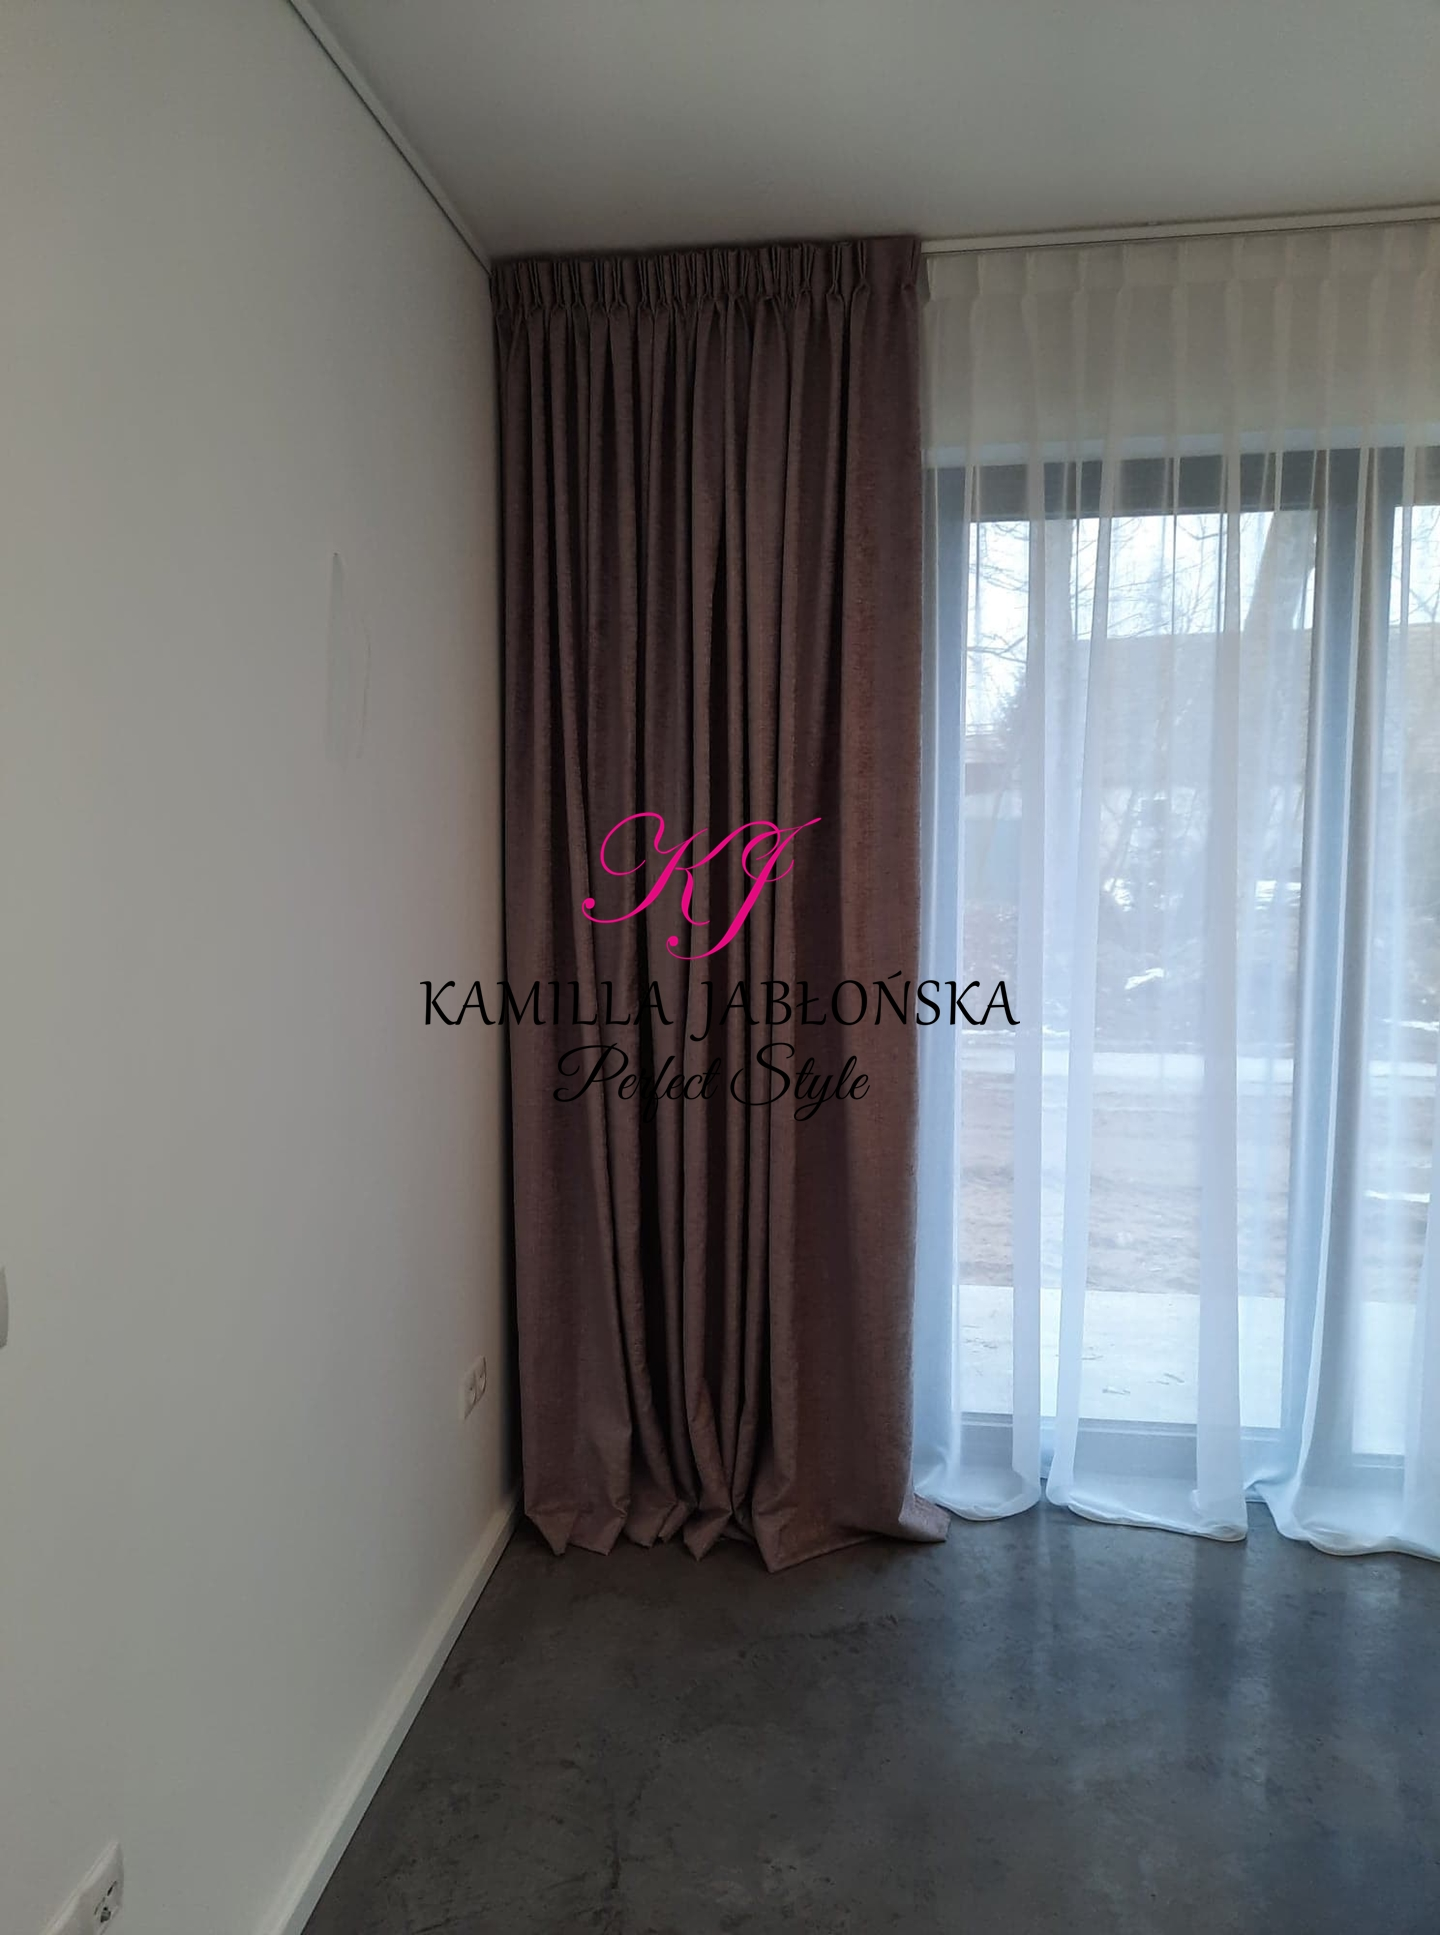 021Perfect Style Kamilla Jabłońska